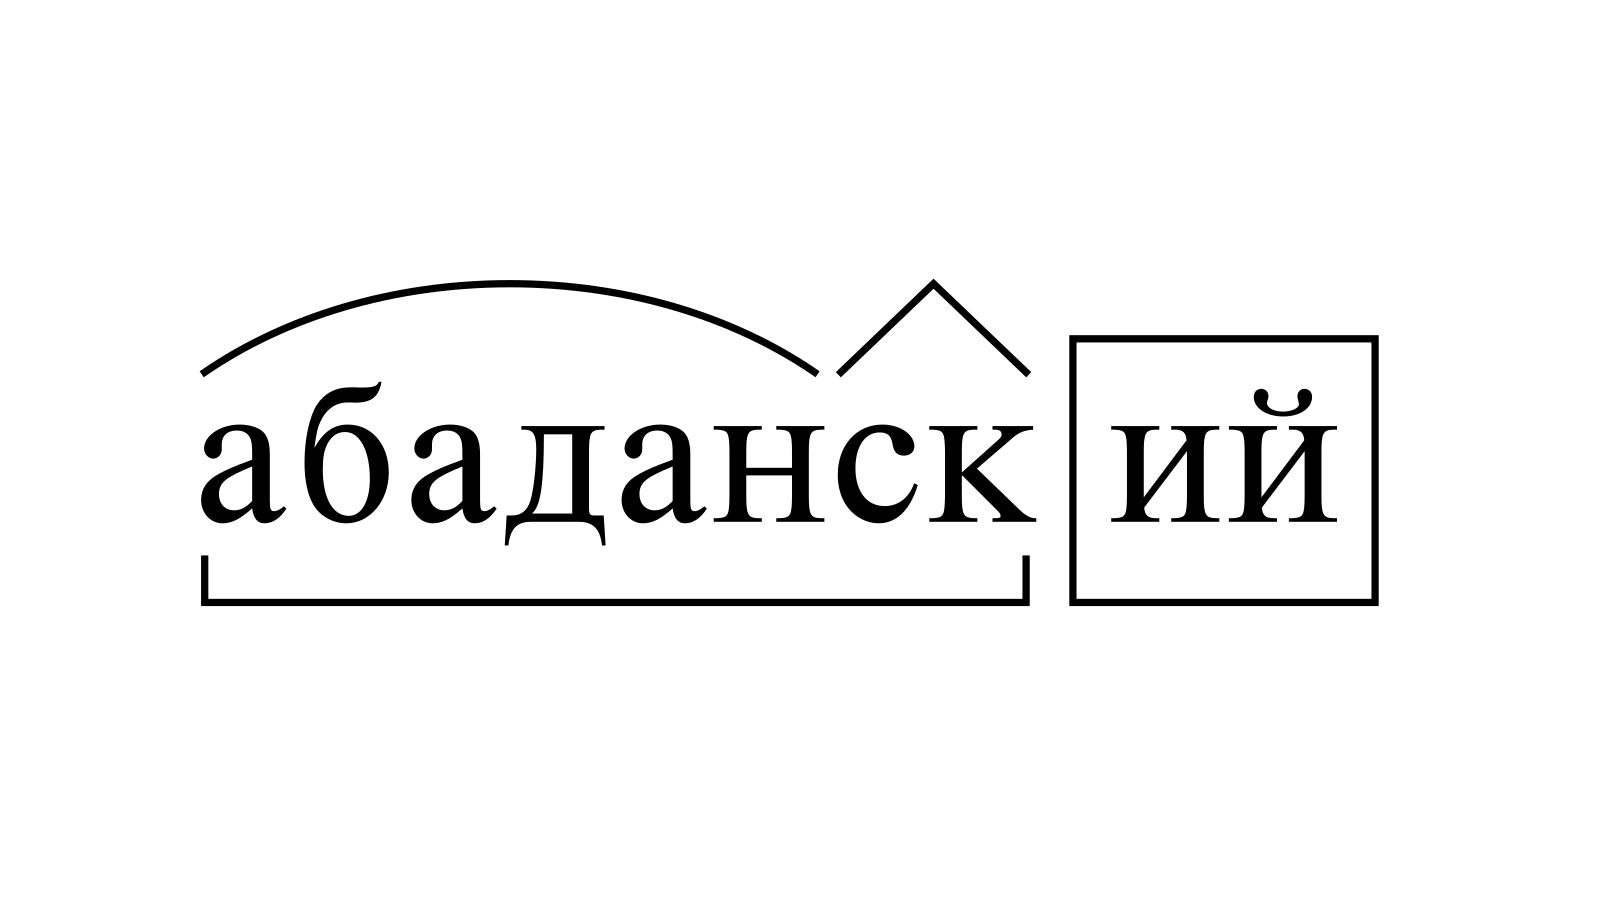 Разбор слова «абаданский» по составу